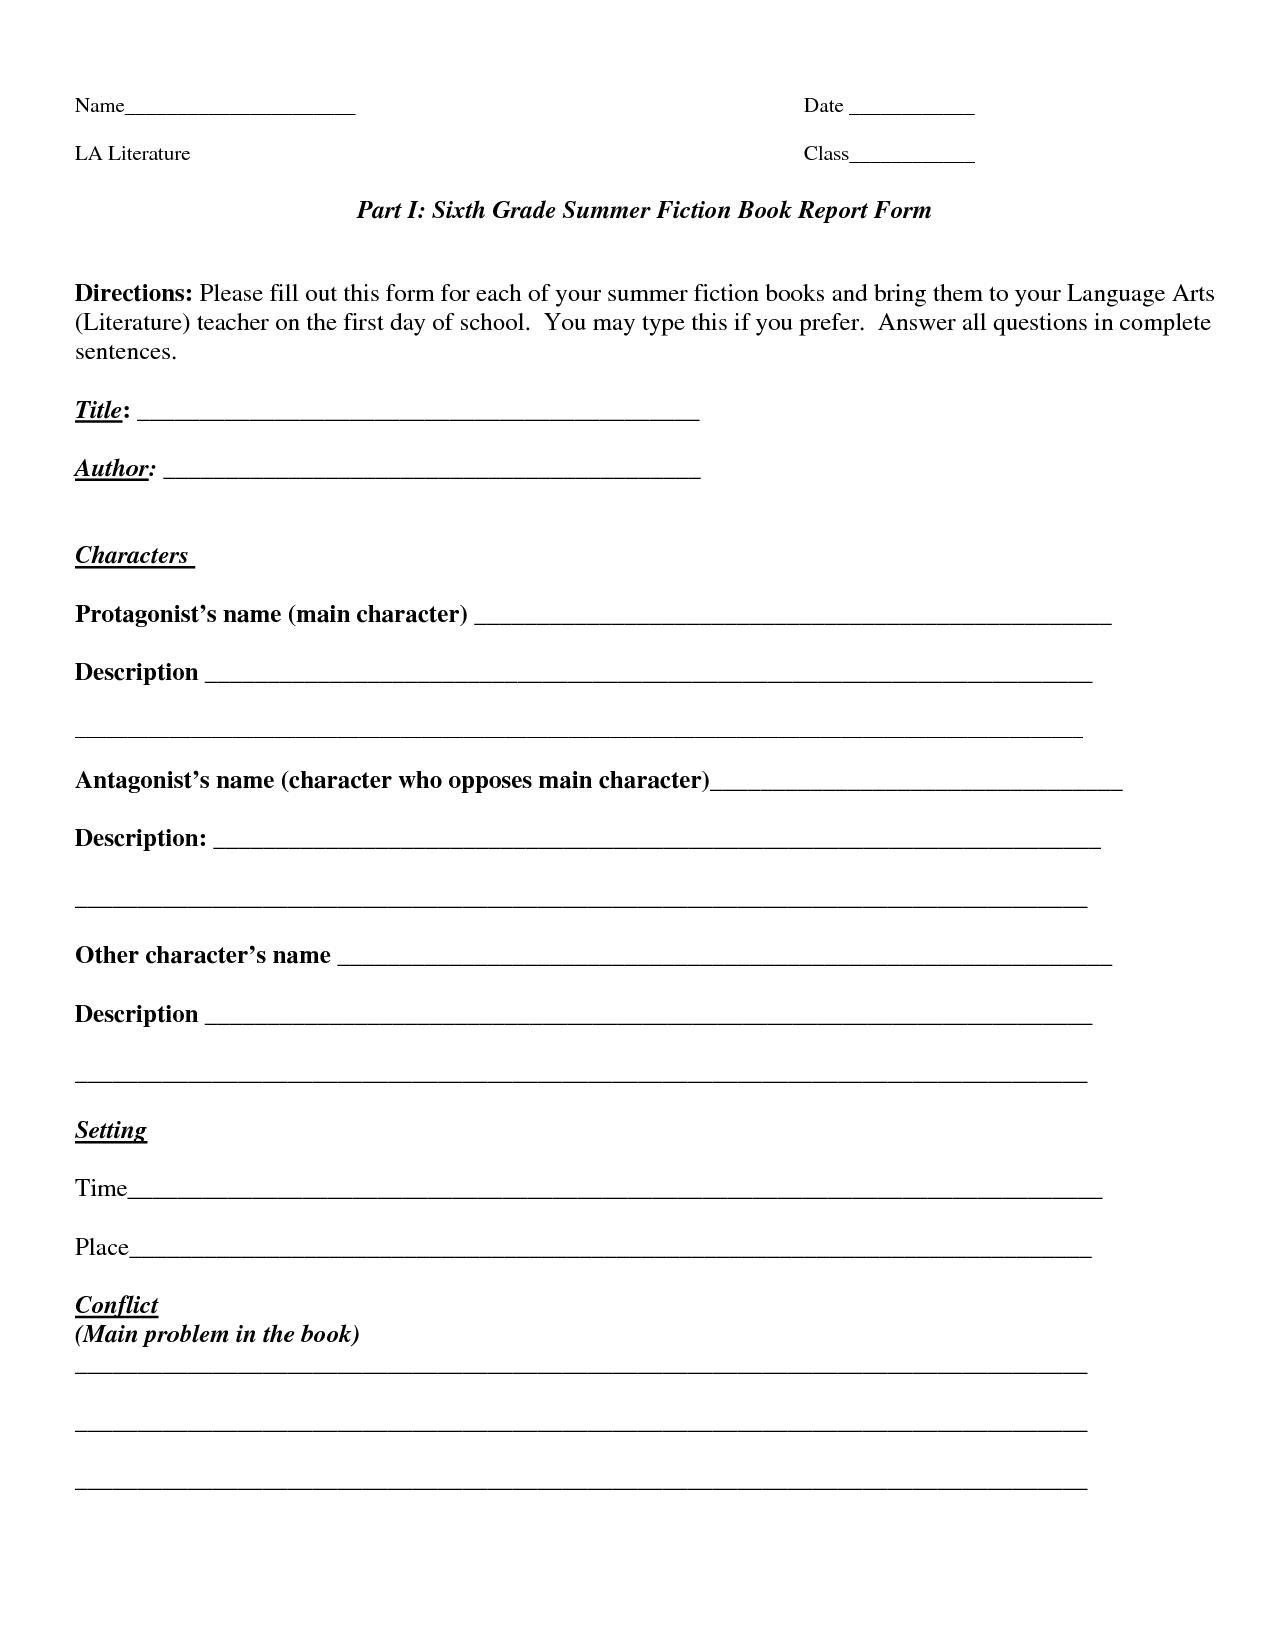 Book Report Template  Part I Sixth Grade Summer Fiction Book Report In Story Skeleton Book Report Template